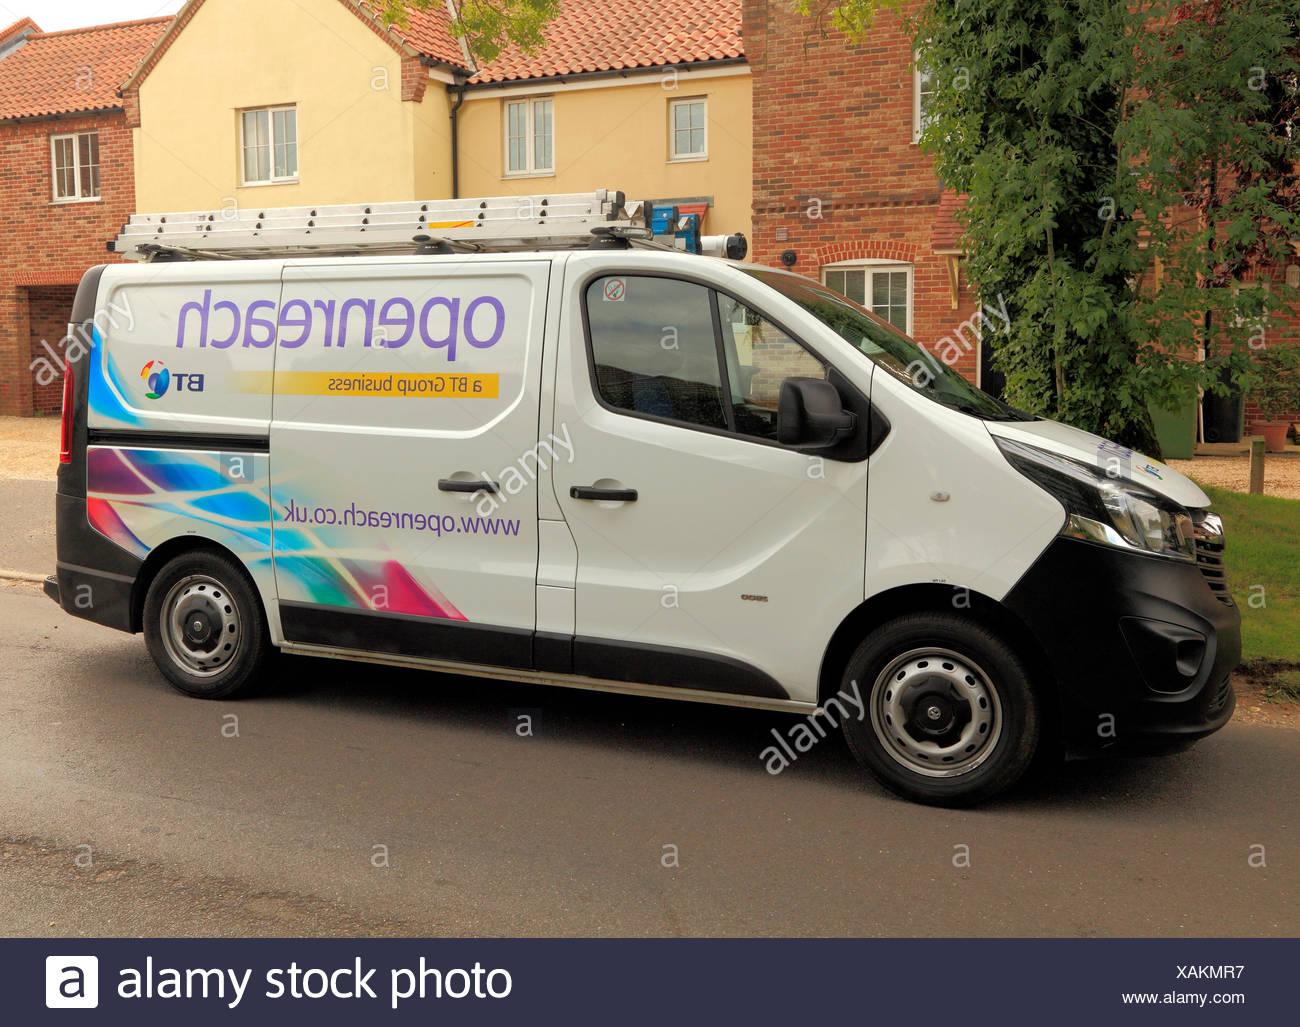 Openreach, Open Reach, BT, British Telecom, van, service, repair, vehicle, vehicles, vans, repairs, maintenance, England, UK - Stock Image